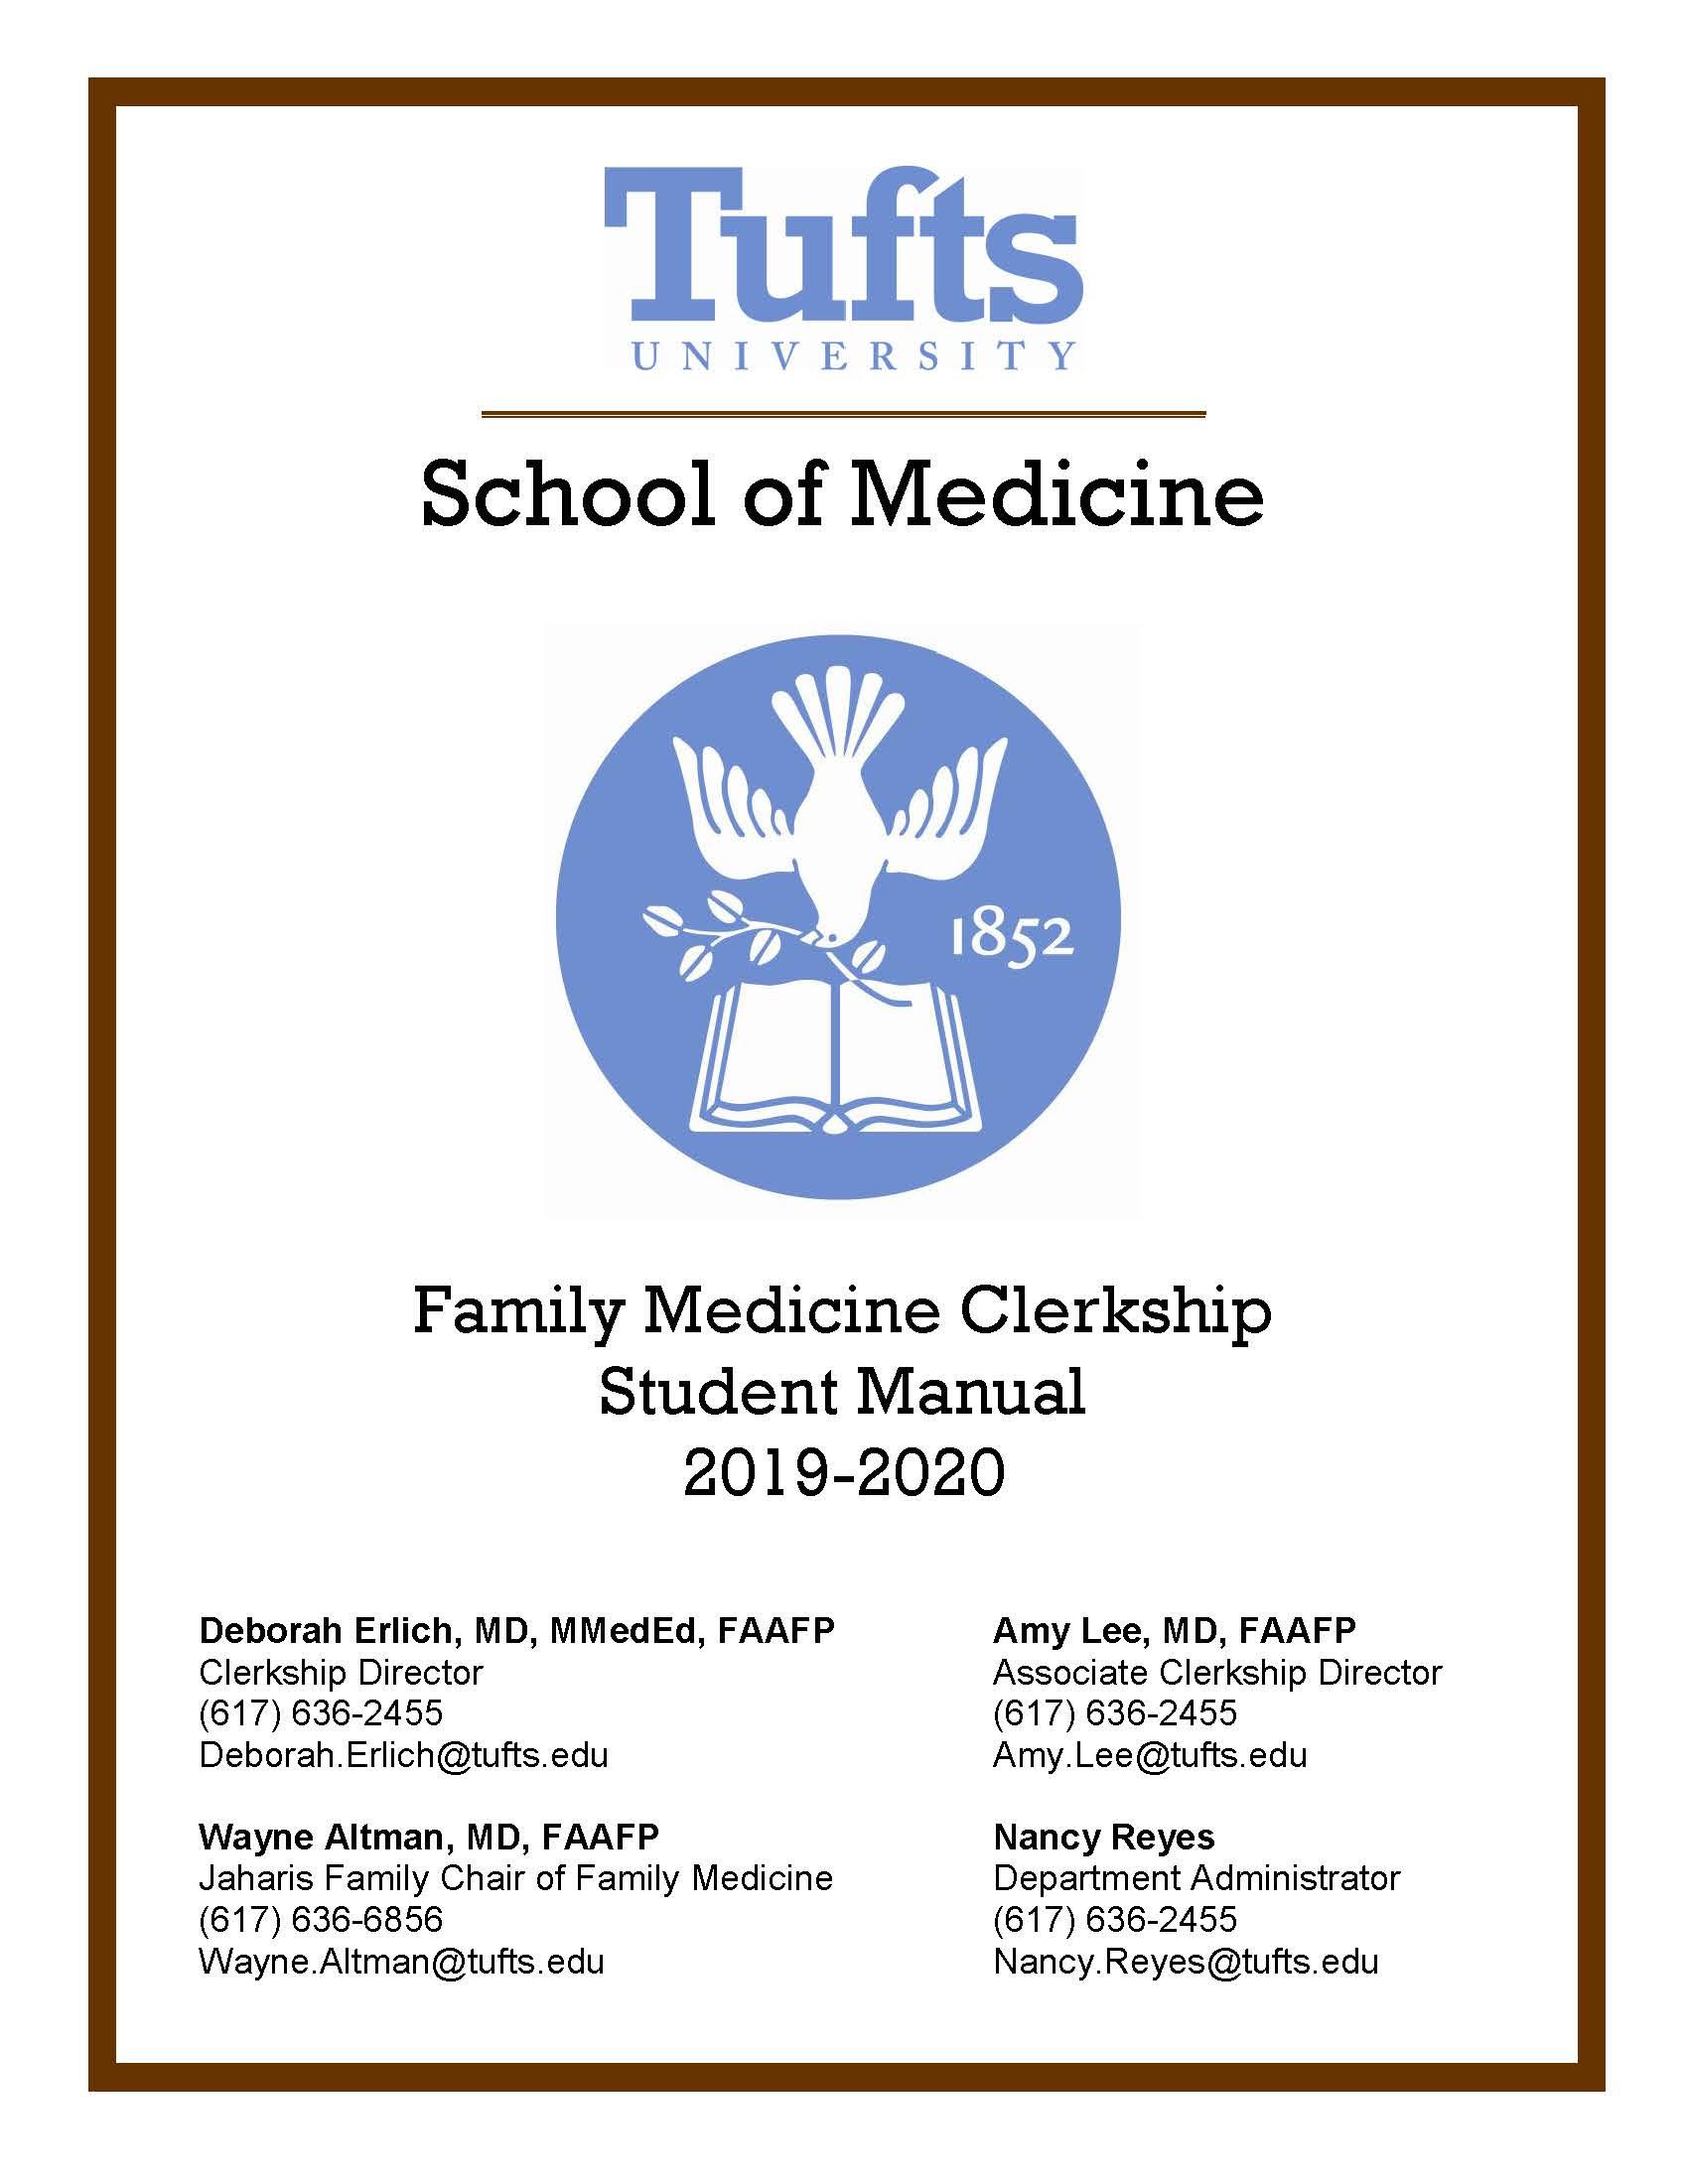 Cover image for 2019-2020 Family Medicine Clerkship